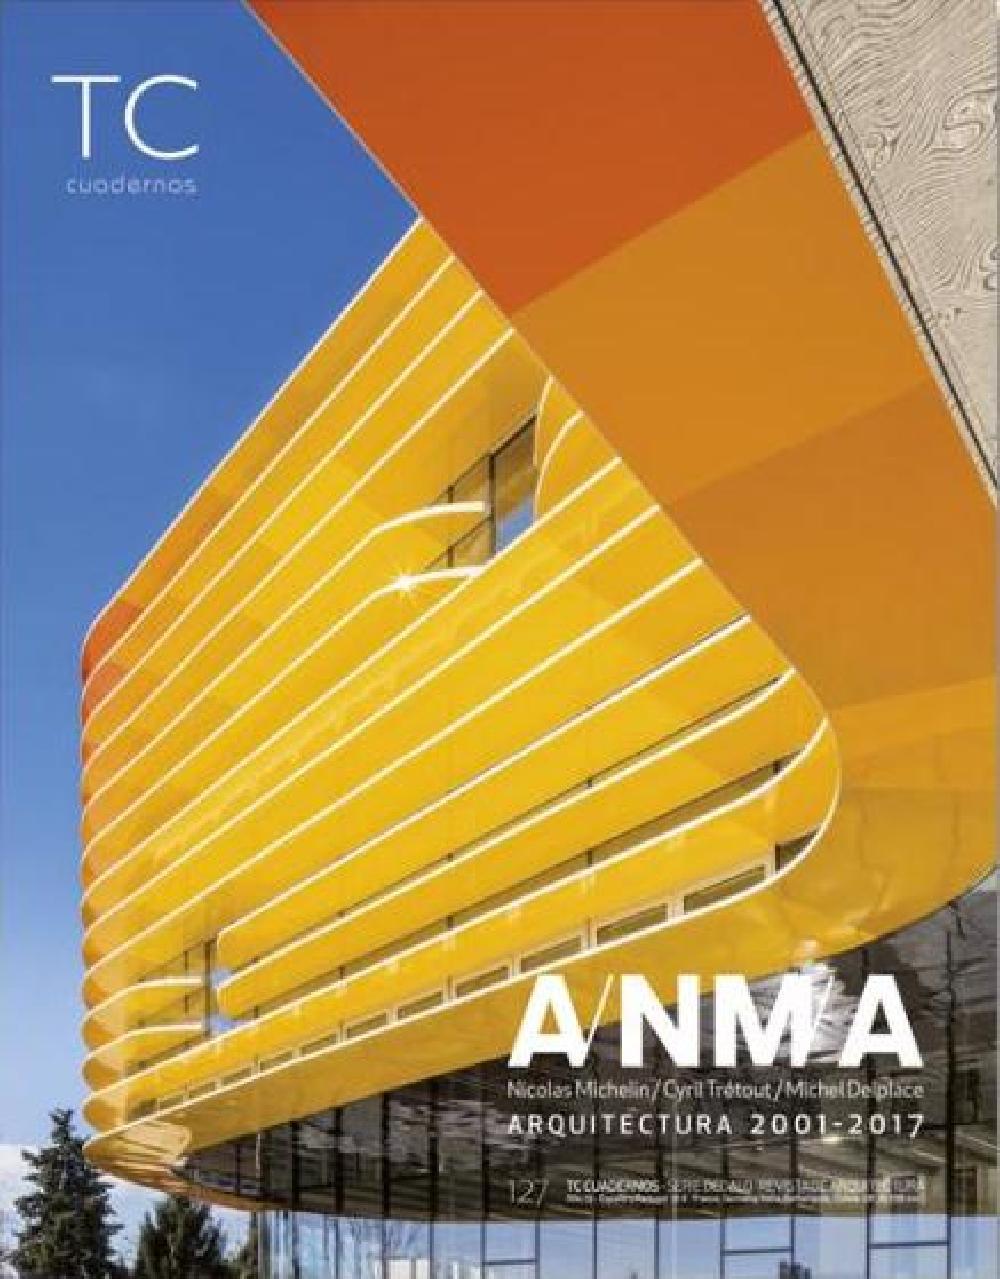 TC cuadernos 127 A/NM/A 2001-2017